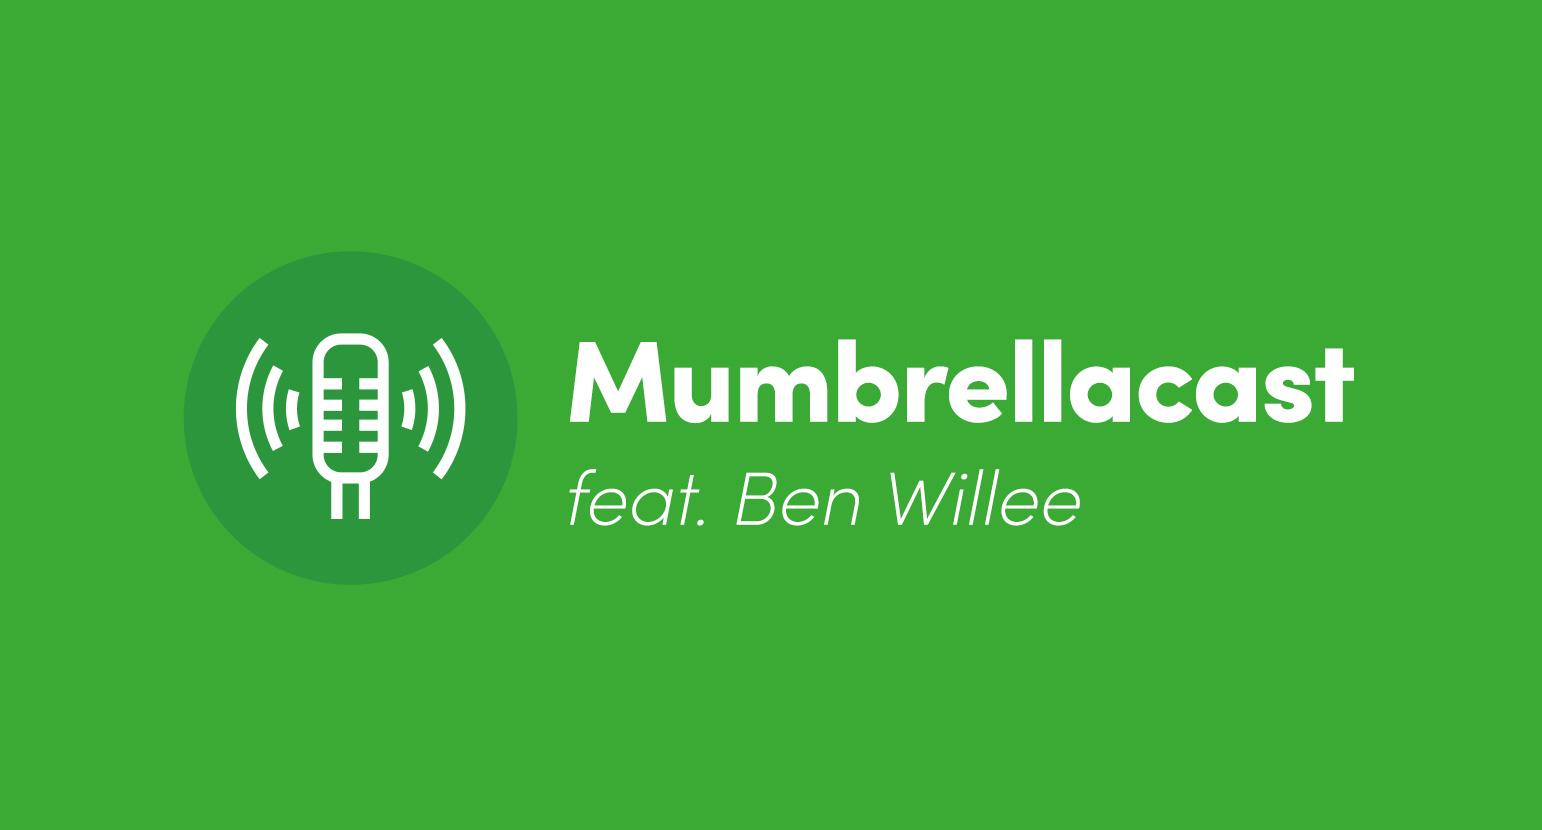 Mumbrellacast feat. Ben Willee